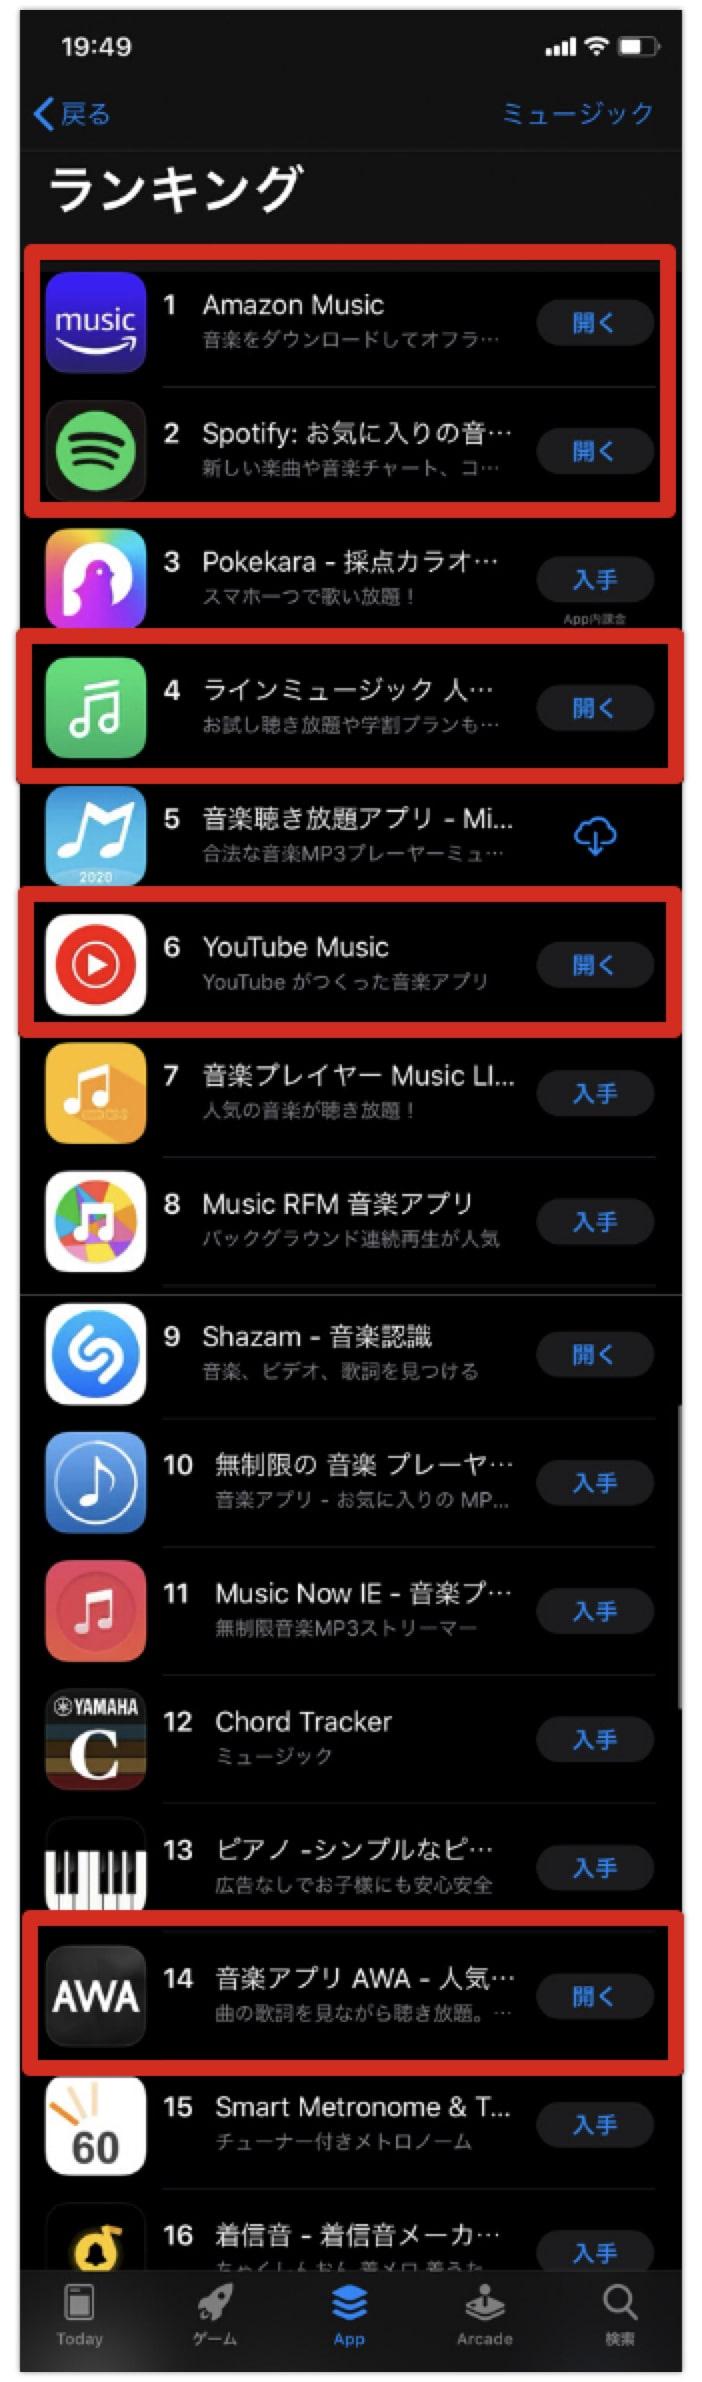 SAYALA MUSICをご存知だろうか?2020年日本で最も人気を集める音楽アプリだ!